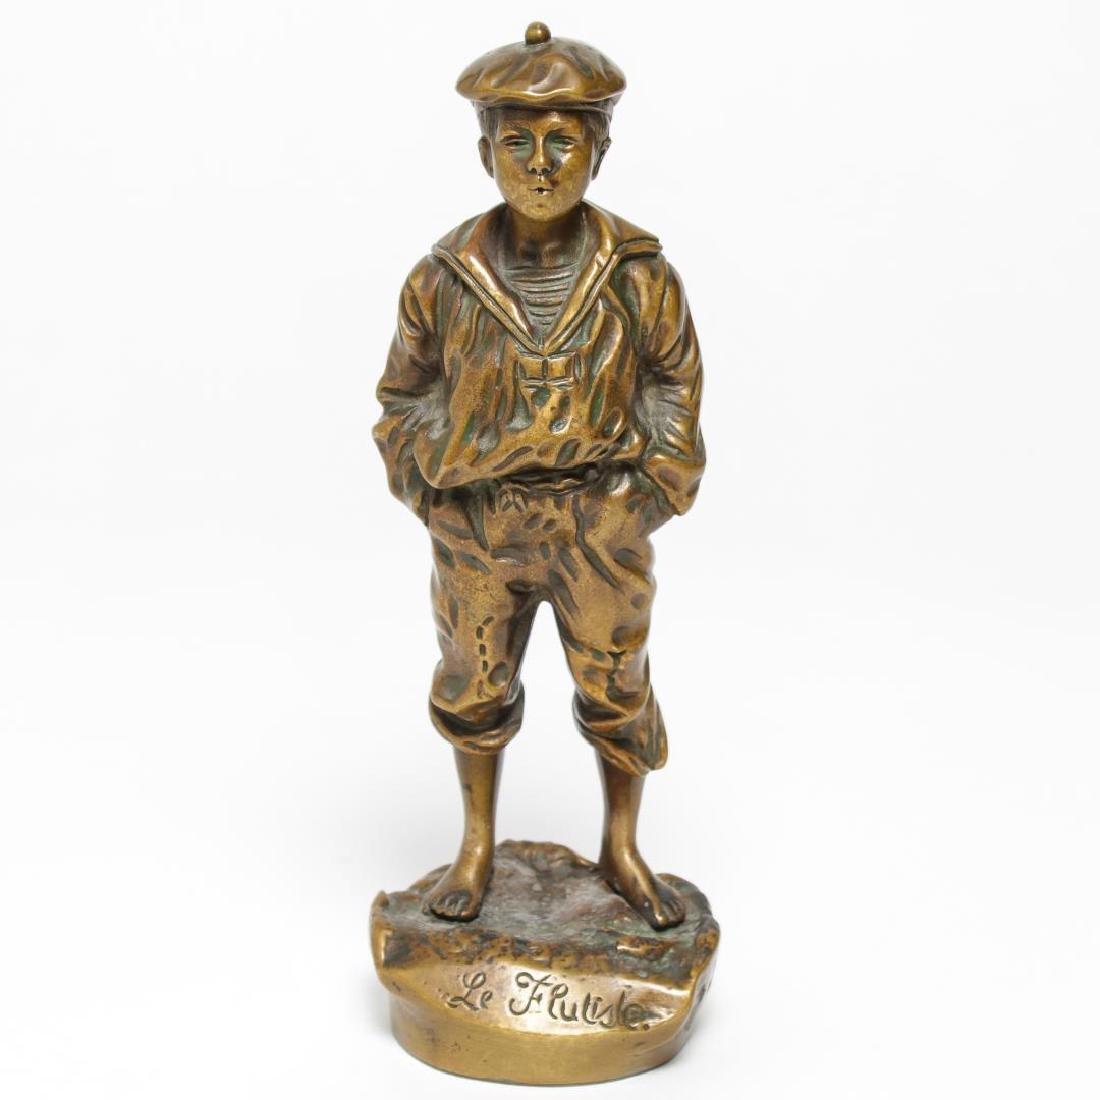 Vintage Bronze Tabletop Sculpture, Le Flutiste